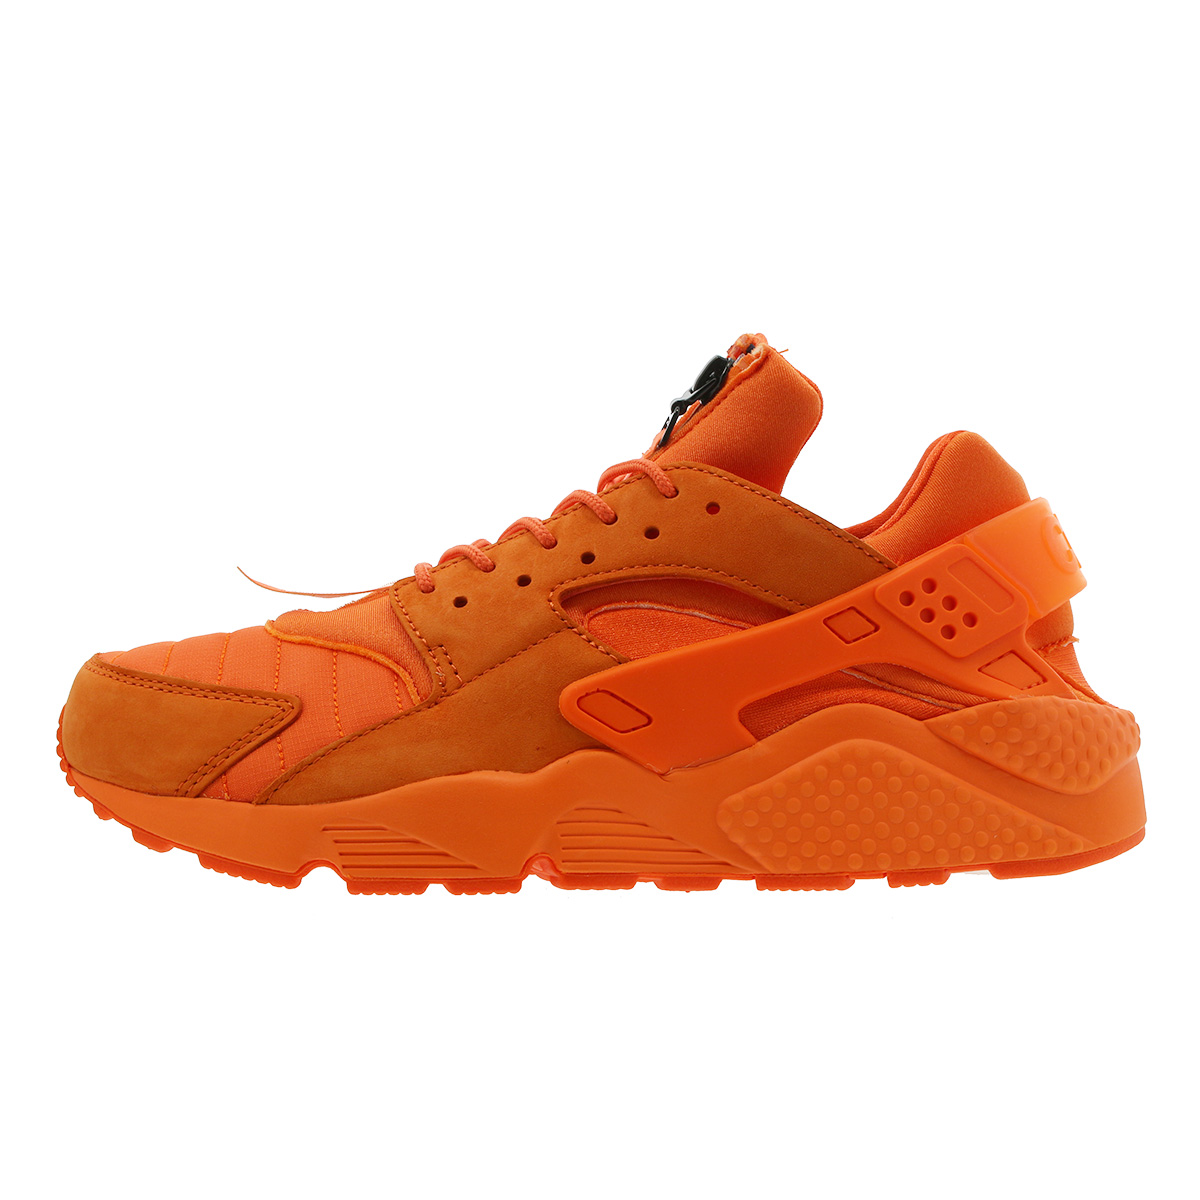 outlet store 4c1df 6d2ce ... france nike air huarache run qs qs orange blaze midnight navy 83ccd  a1f07